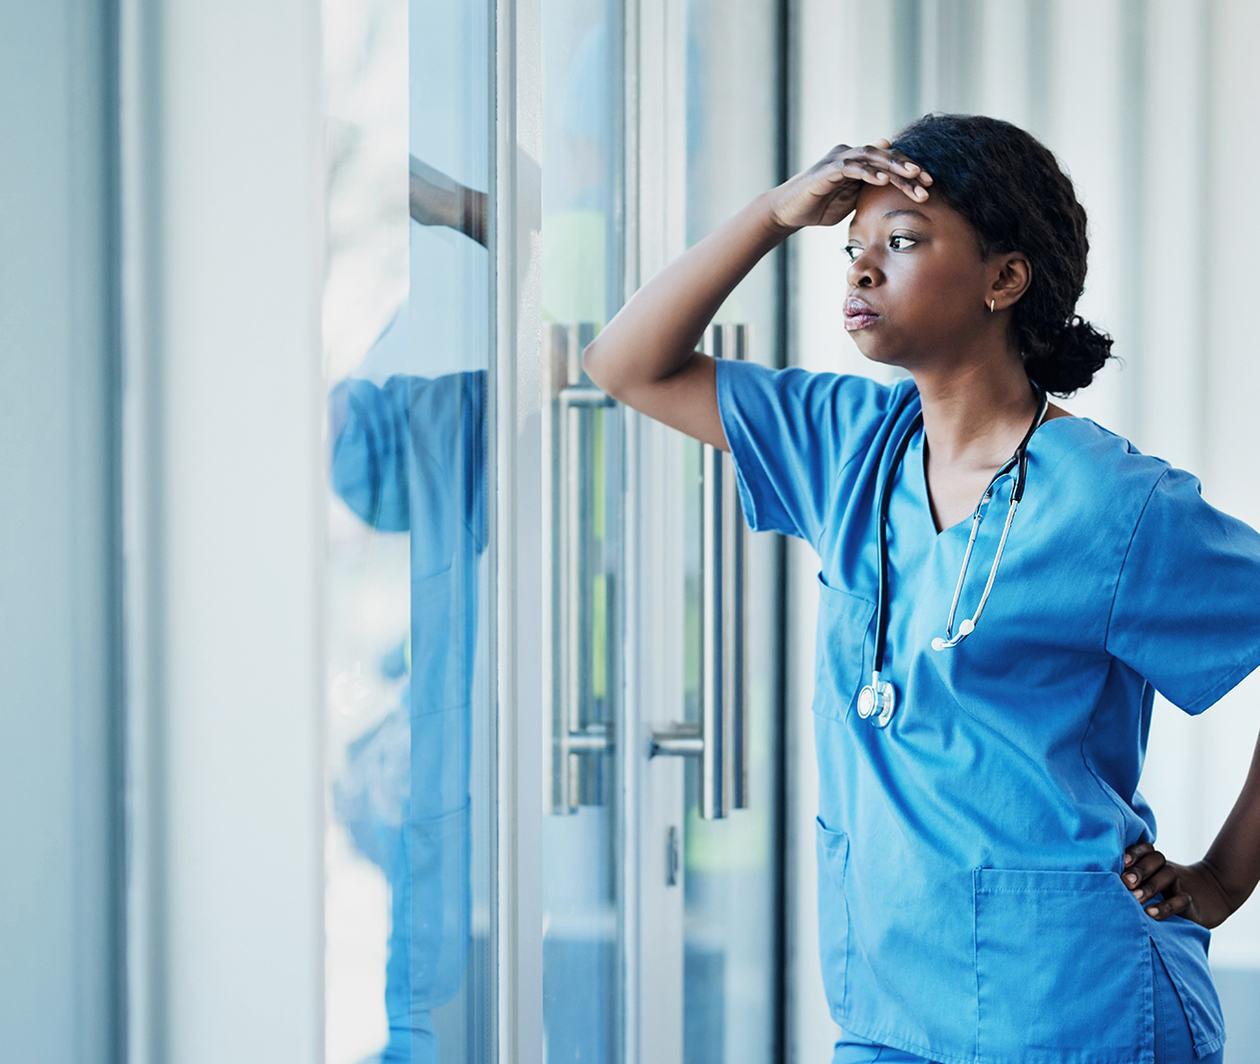 Nursing in Crisis? Exploring Current Challenges